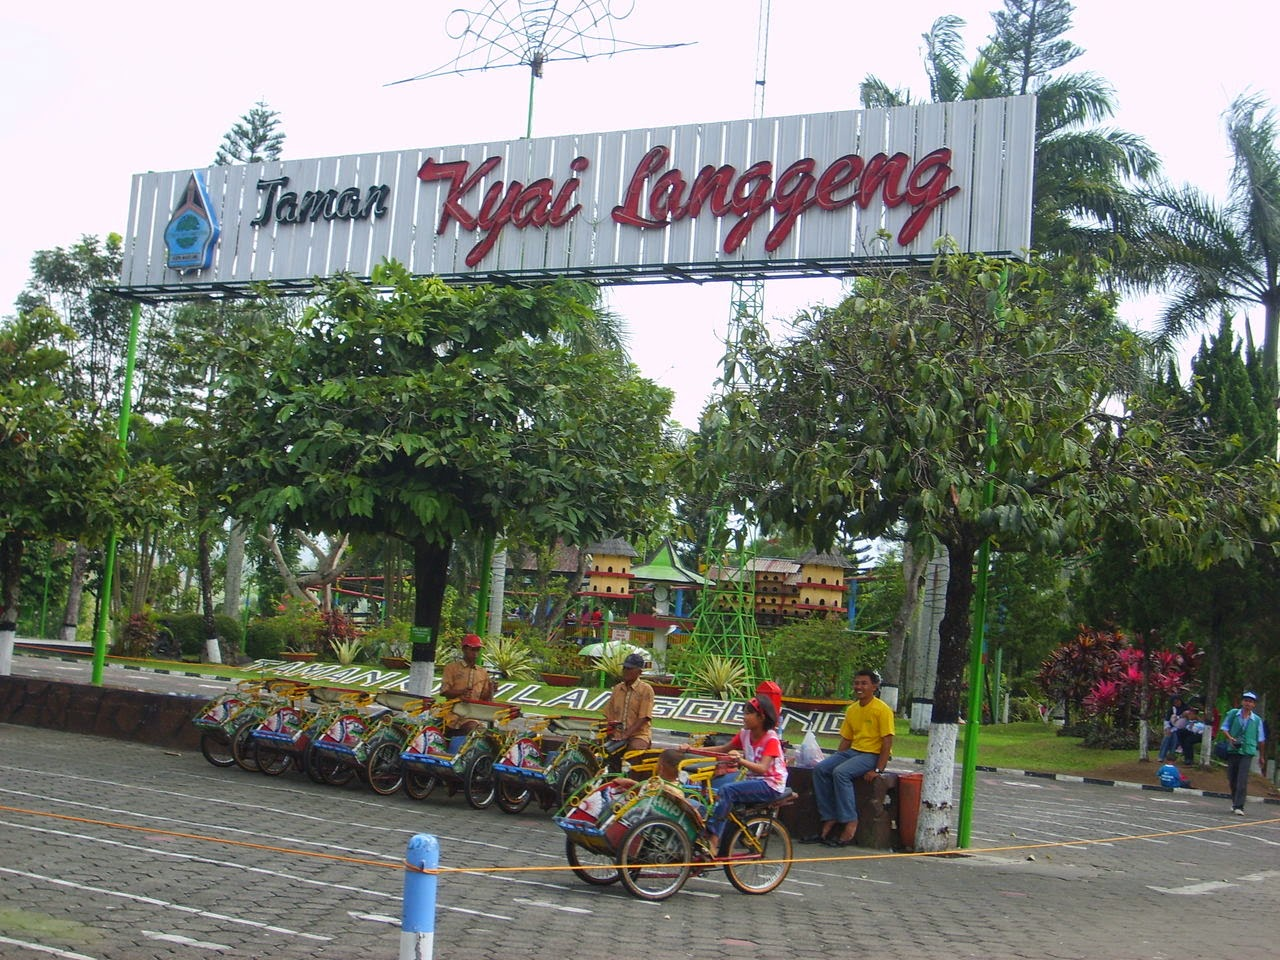 Image result for site:blogspot.com TAMAN KYAI LANGGENG magelang